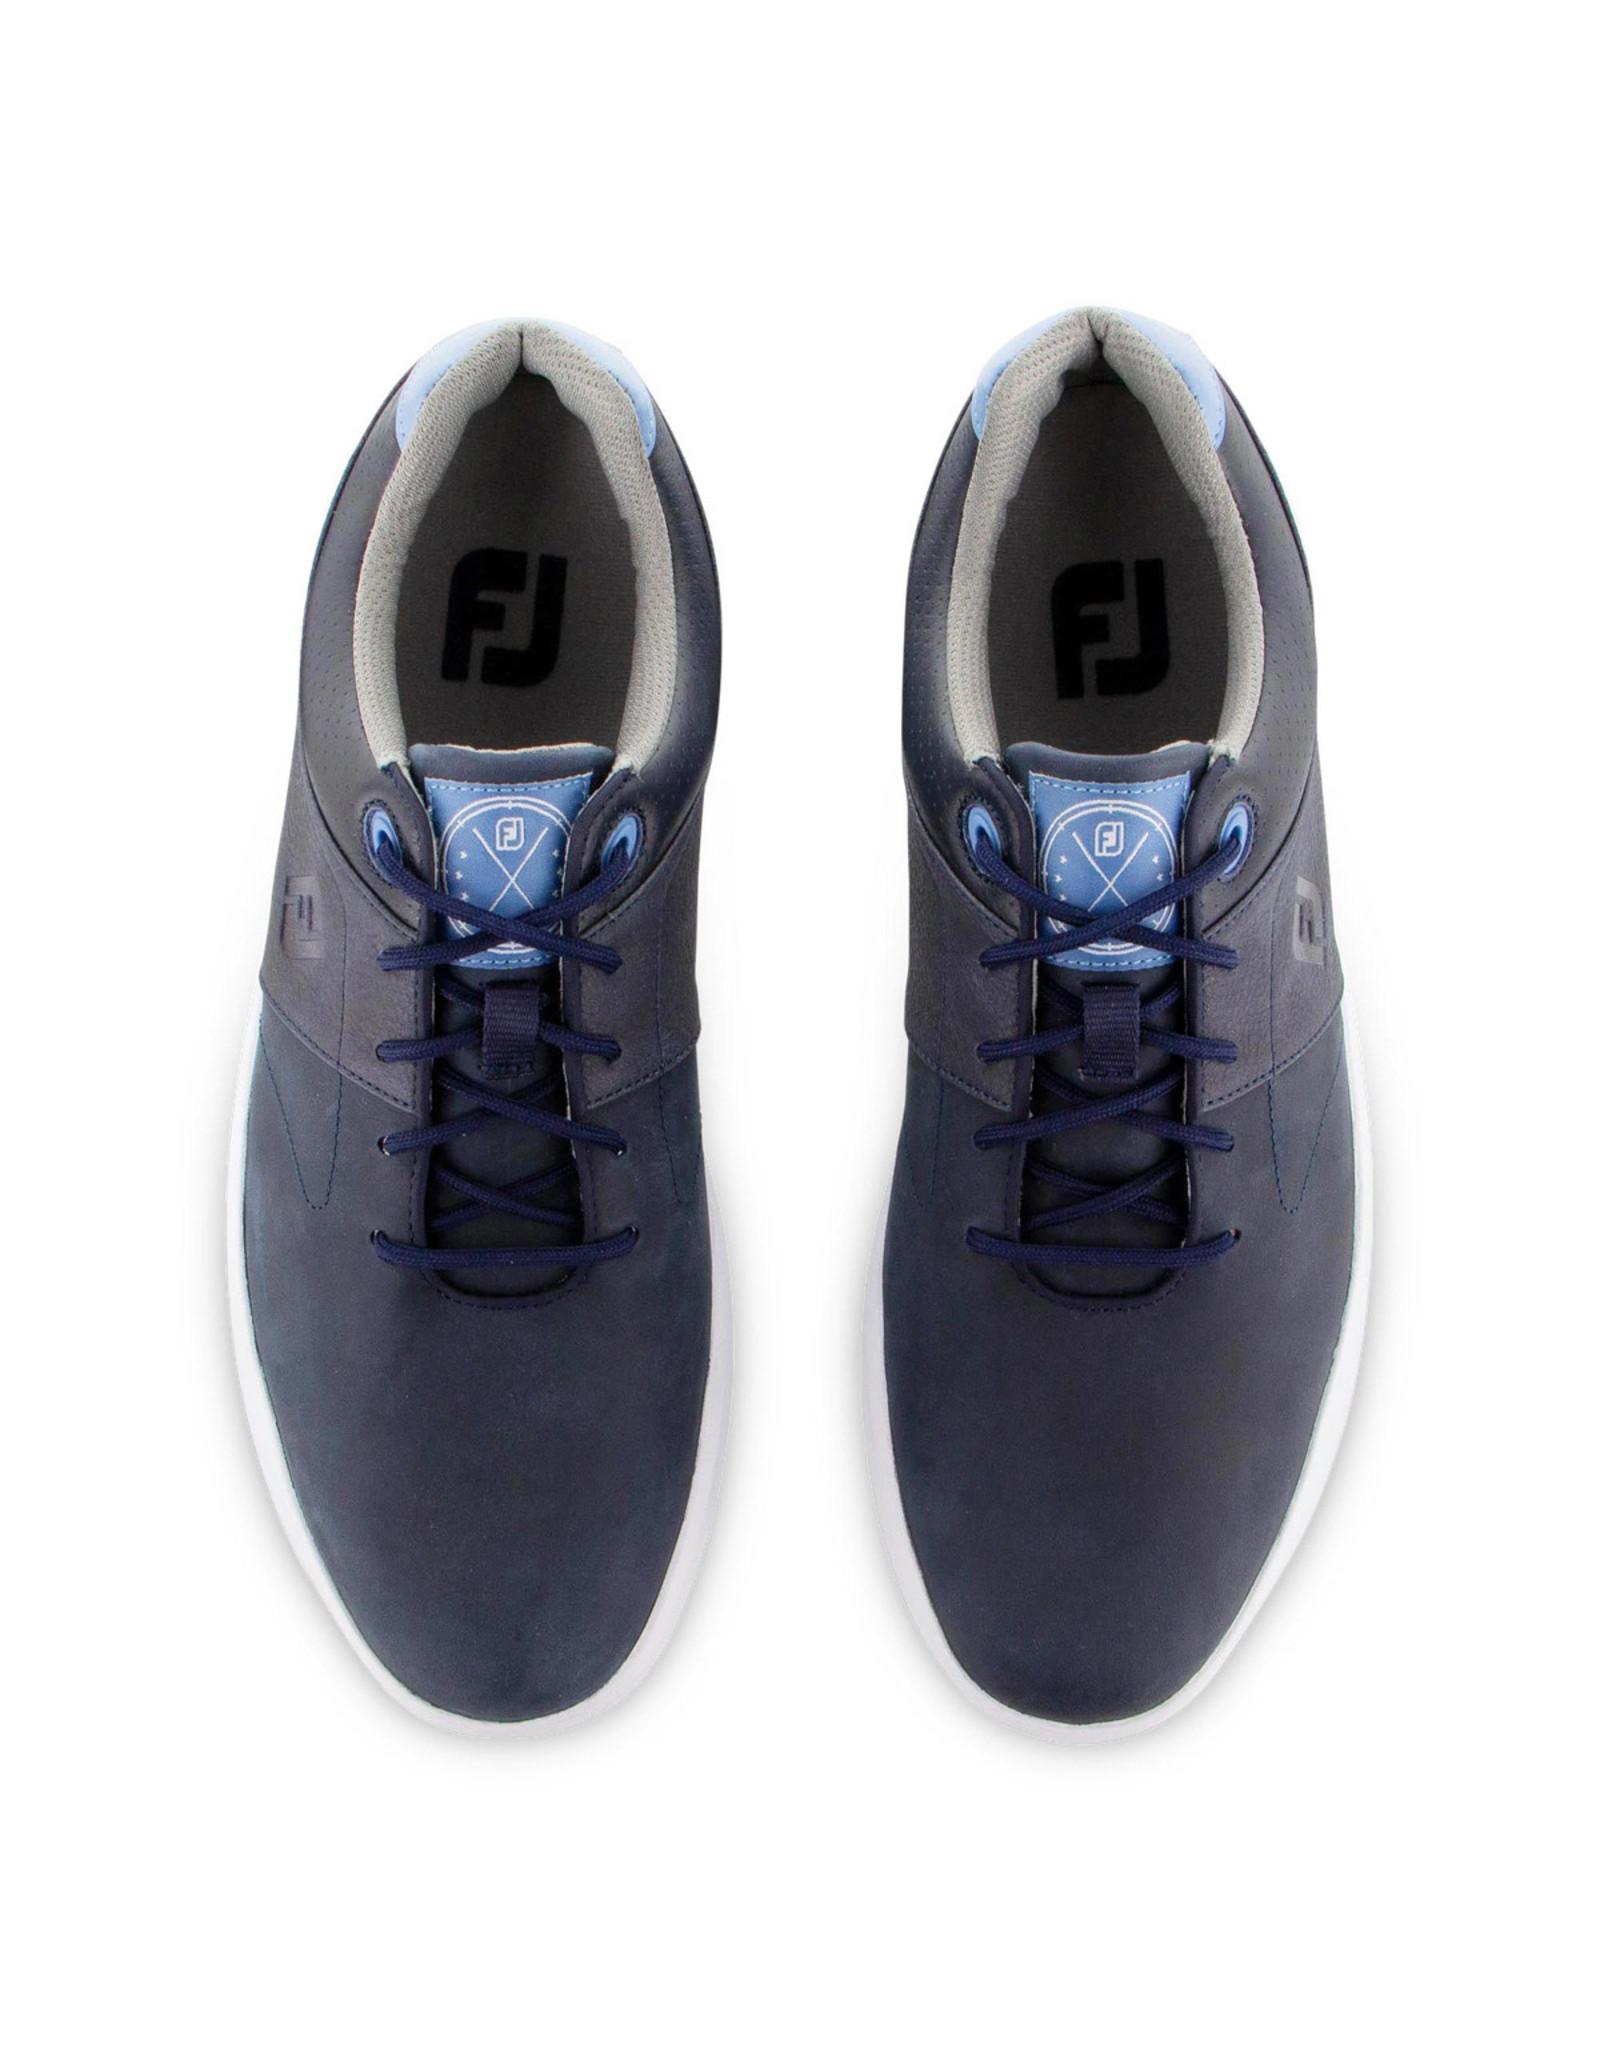 Footjoy FootJoy Contour Series All Navy